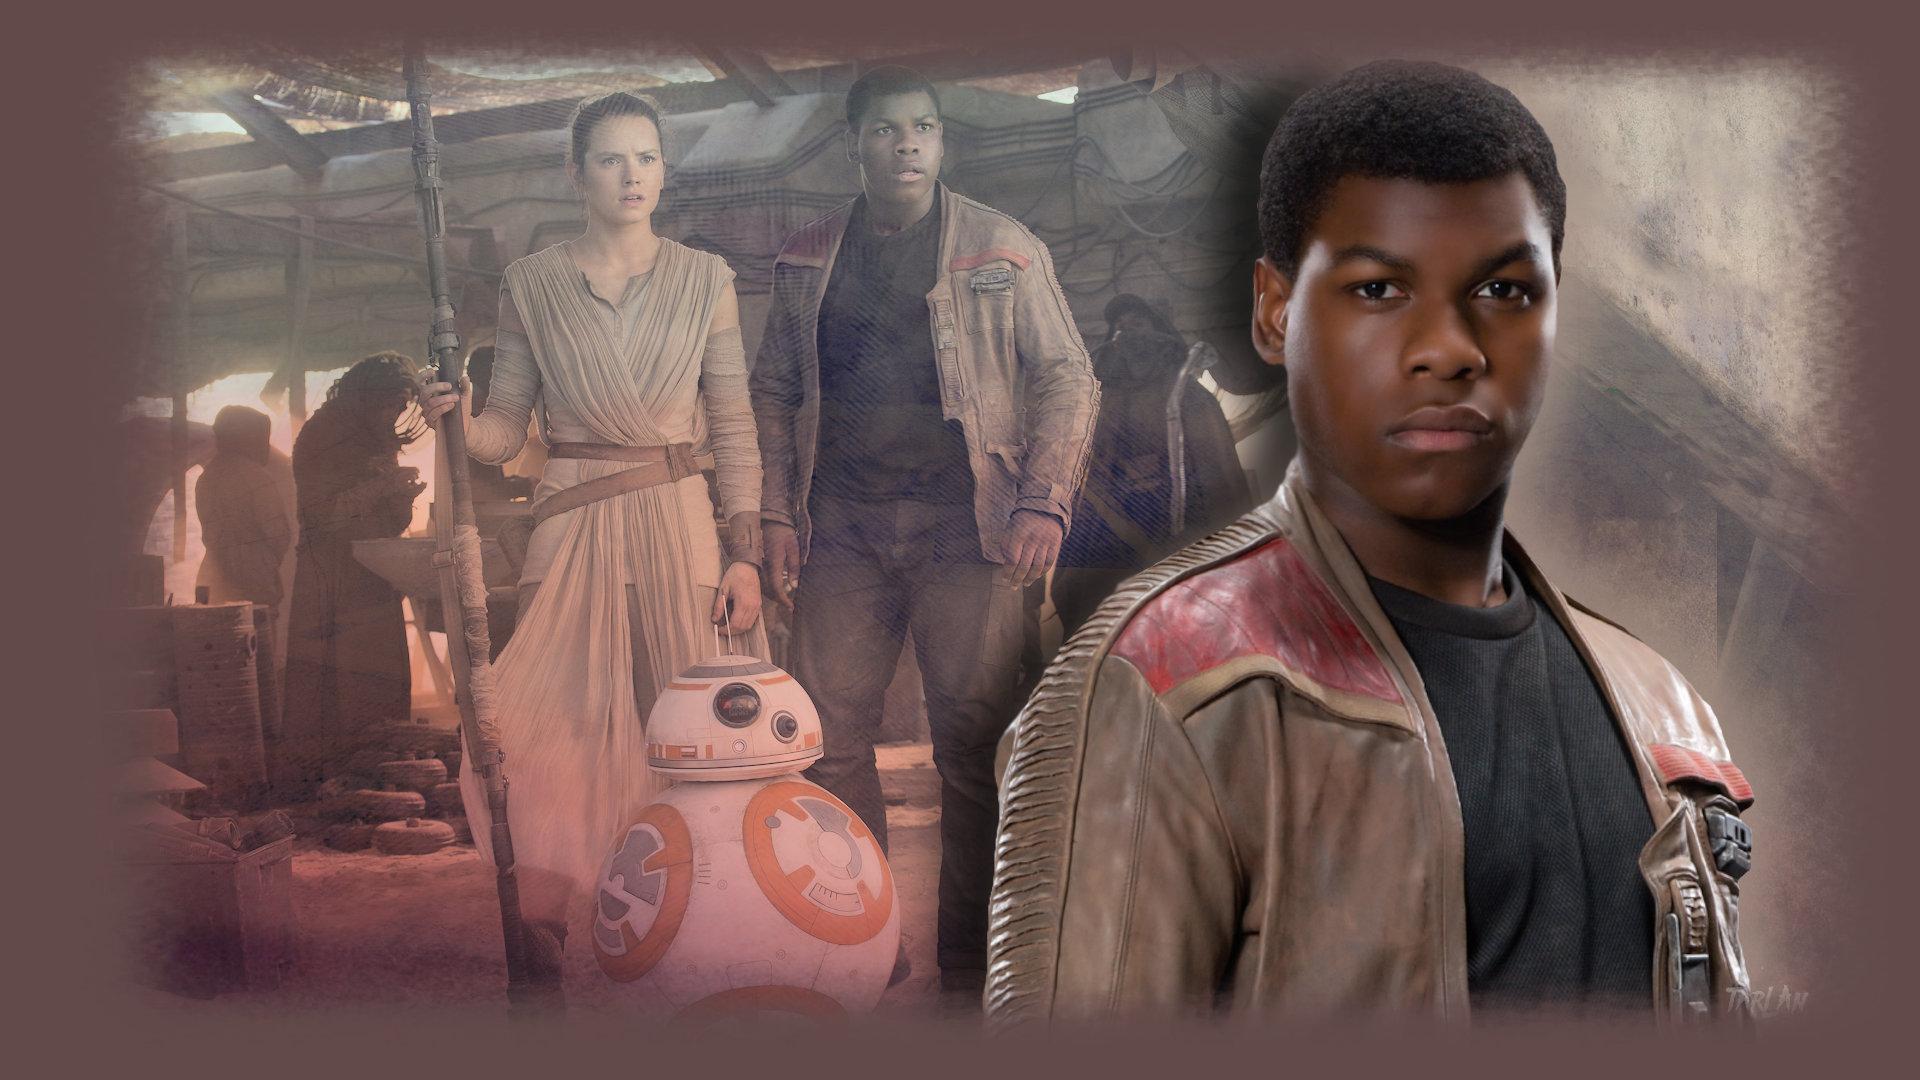 Star Wars - Rey and Finn by Tarlan